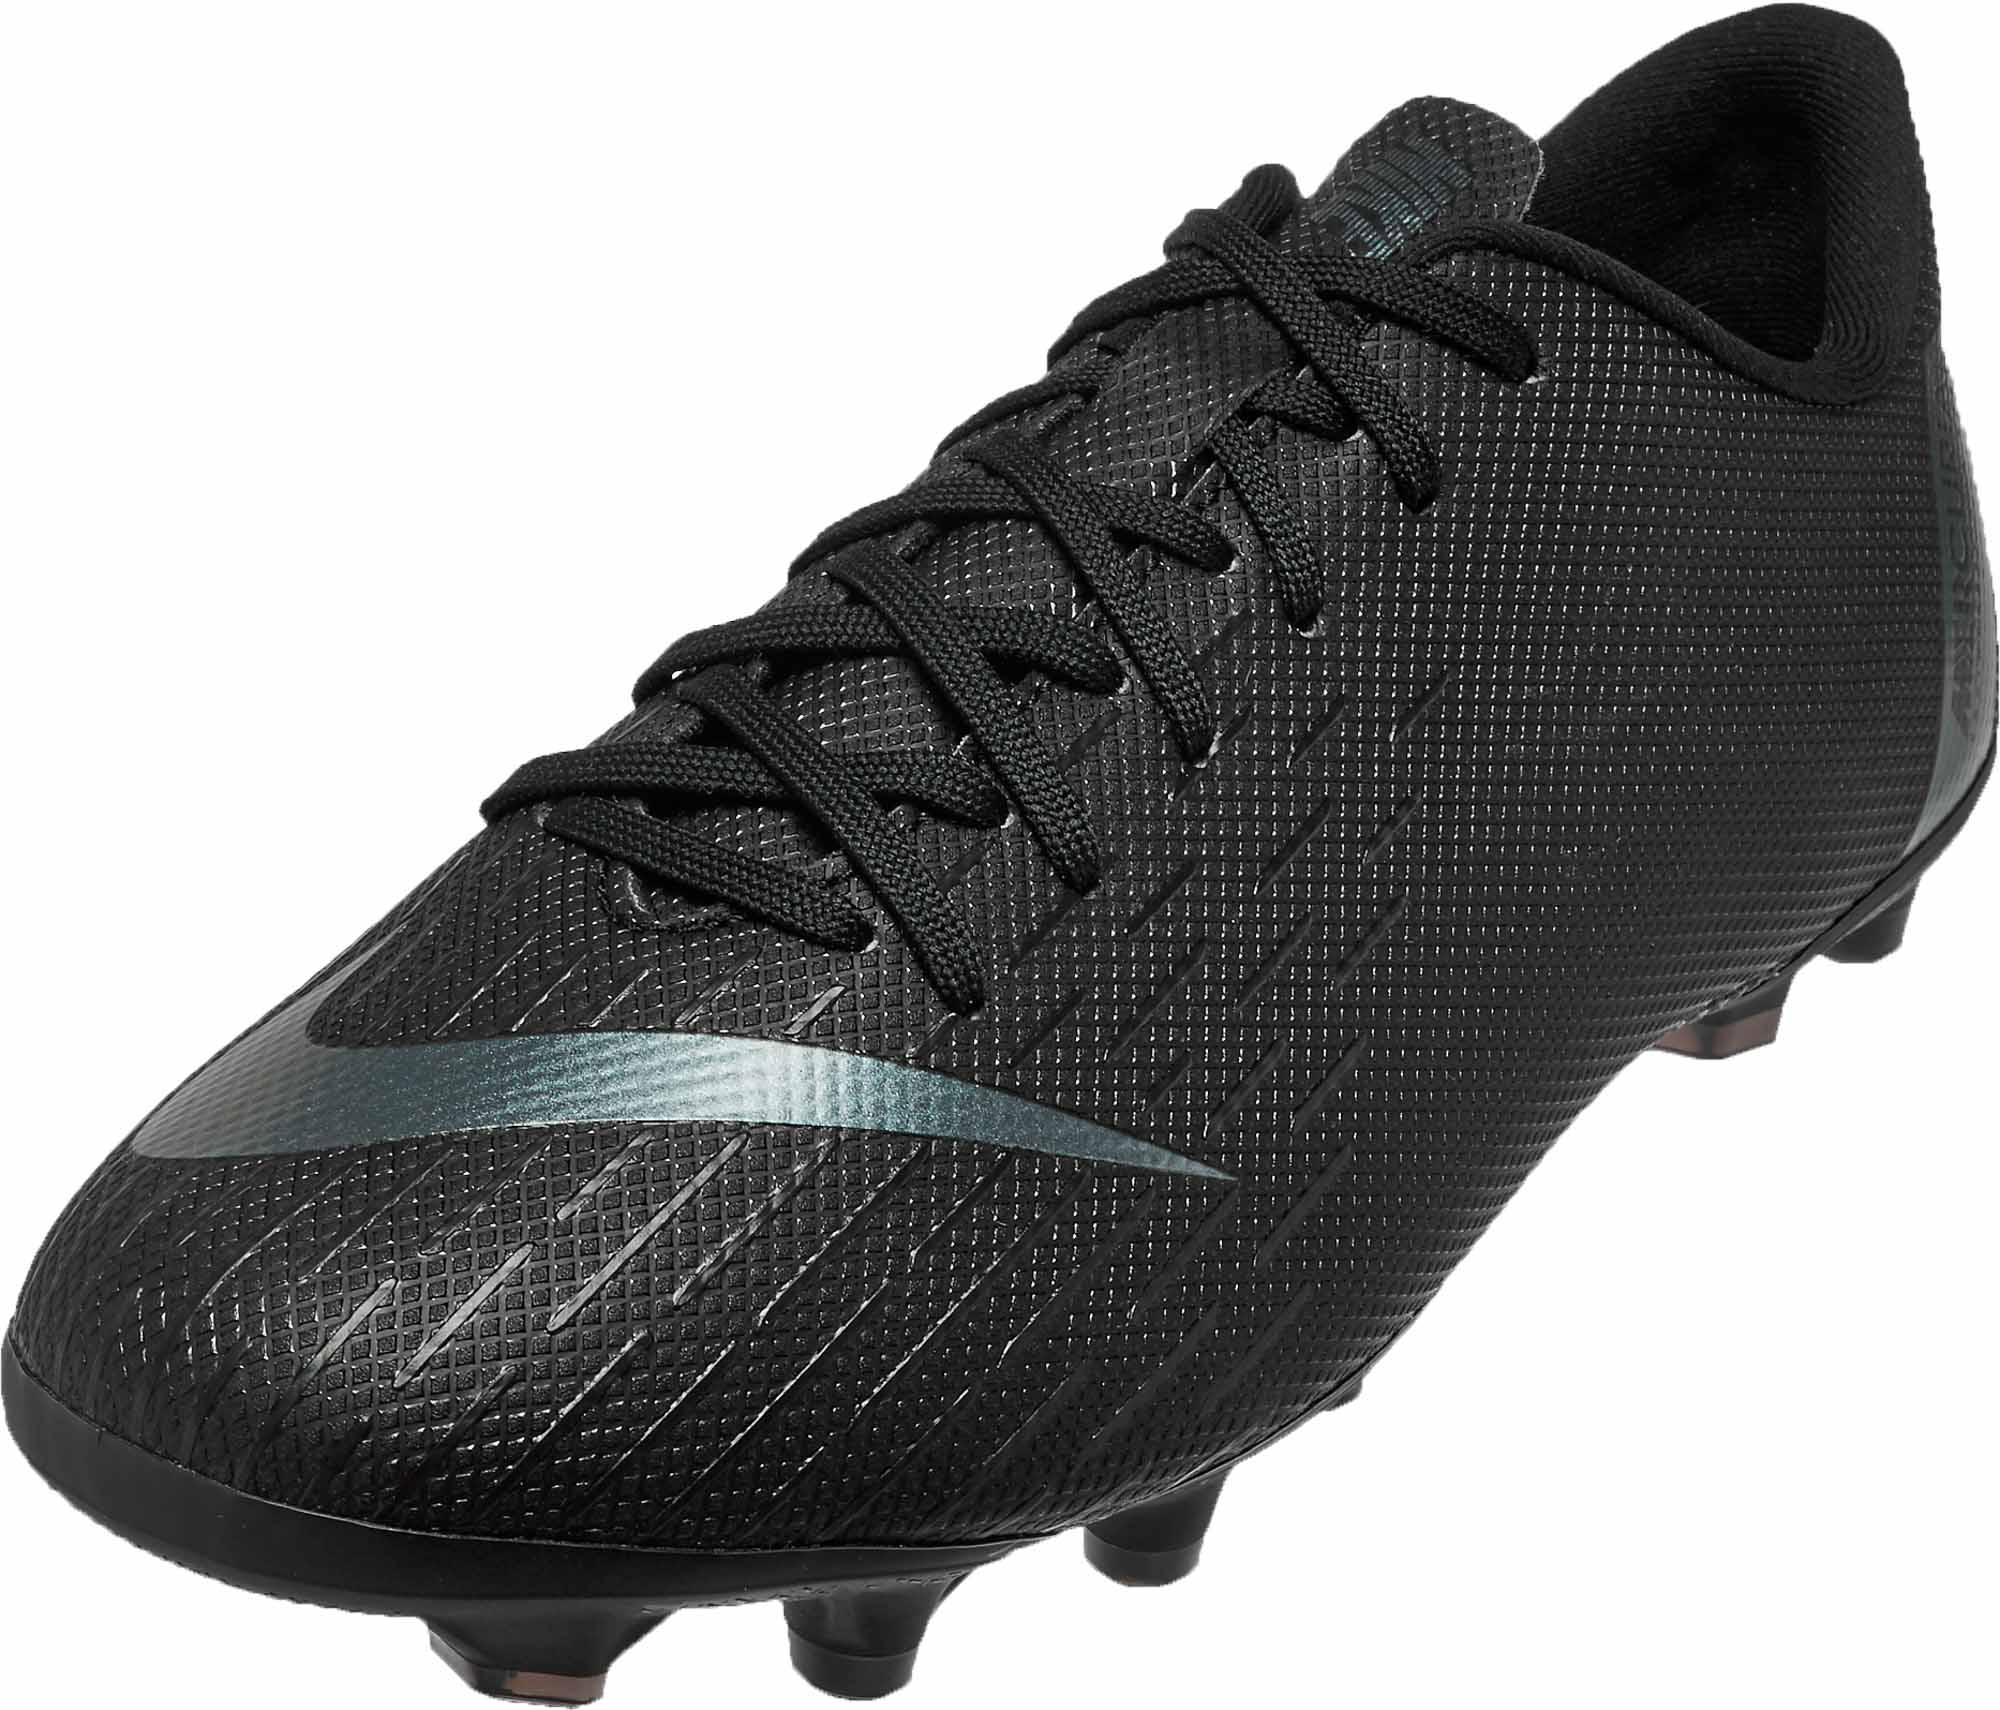 official photos 44b85 5bbff Nike Mercurial Vapor 12 Academy MG – Youth – Black Black